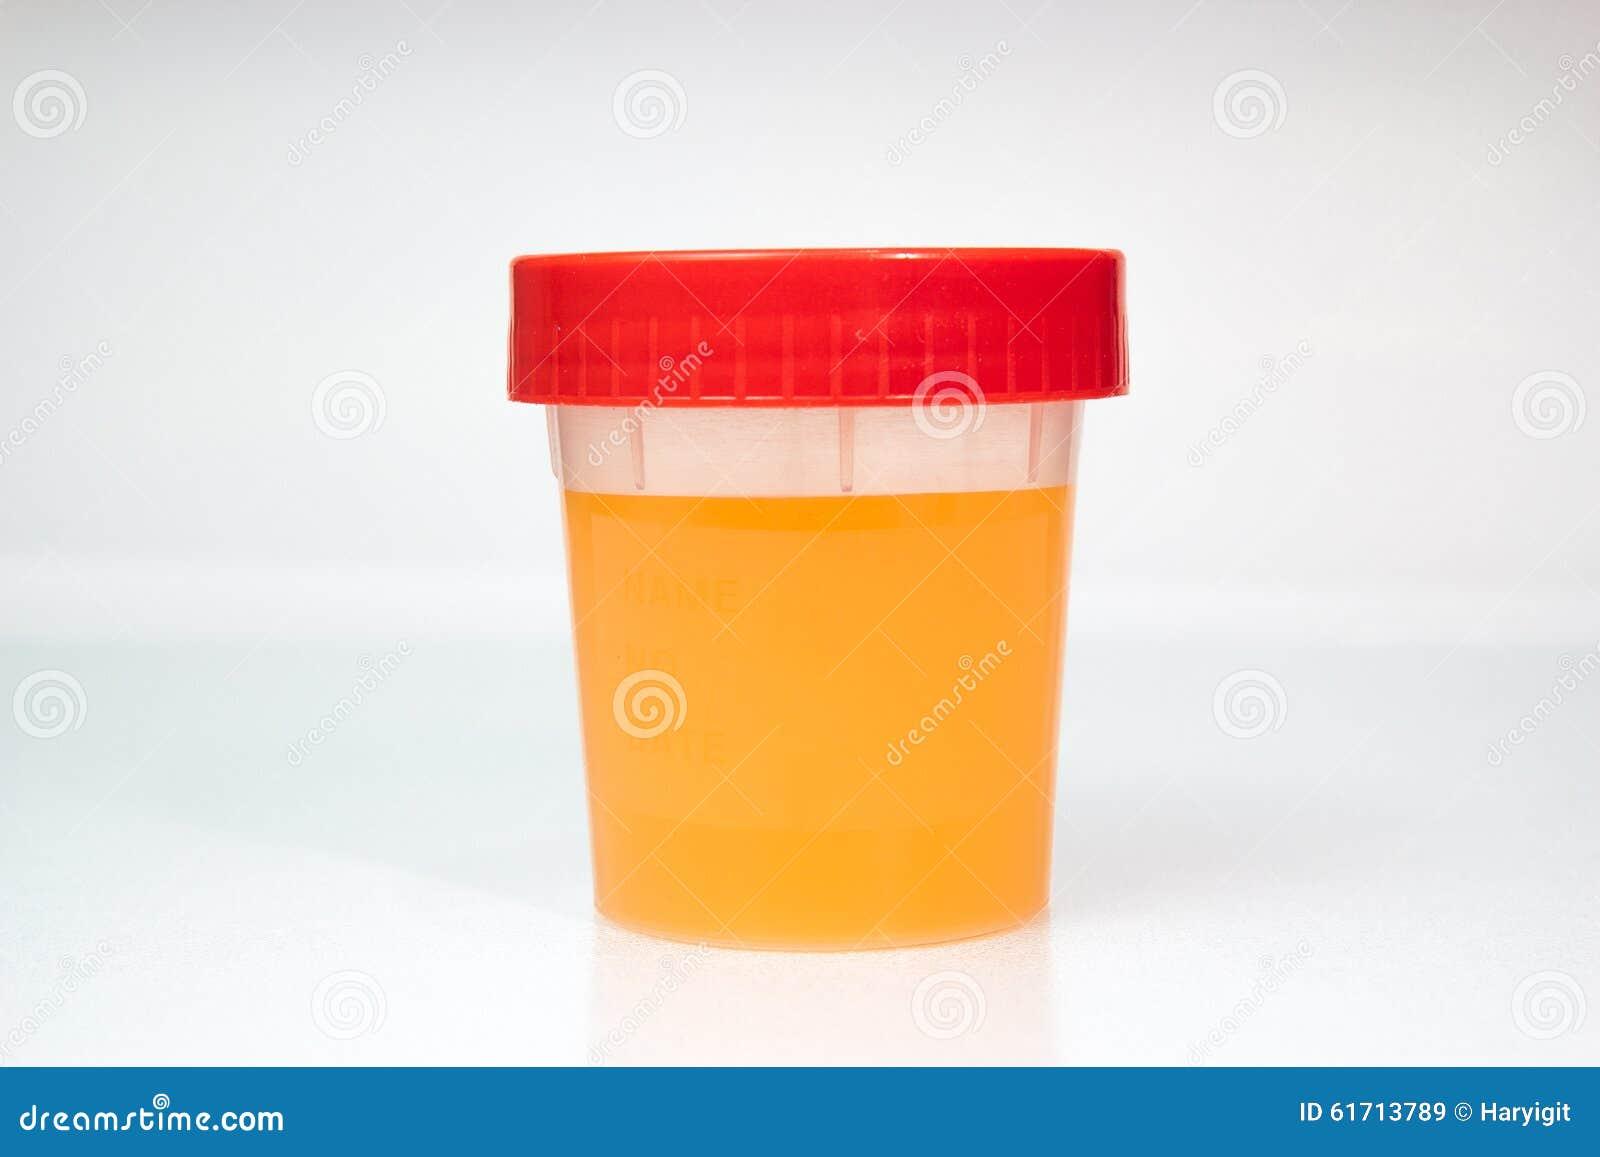 dark orange urination